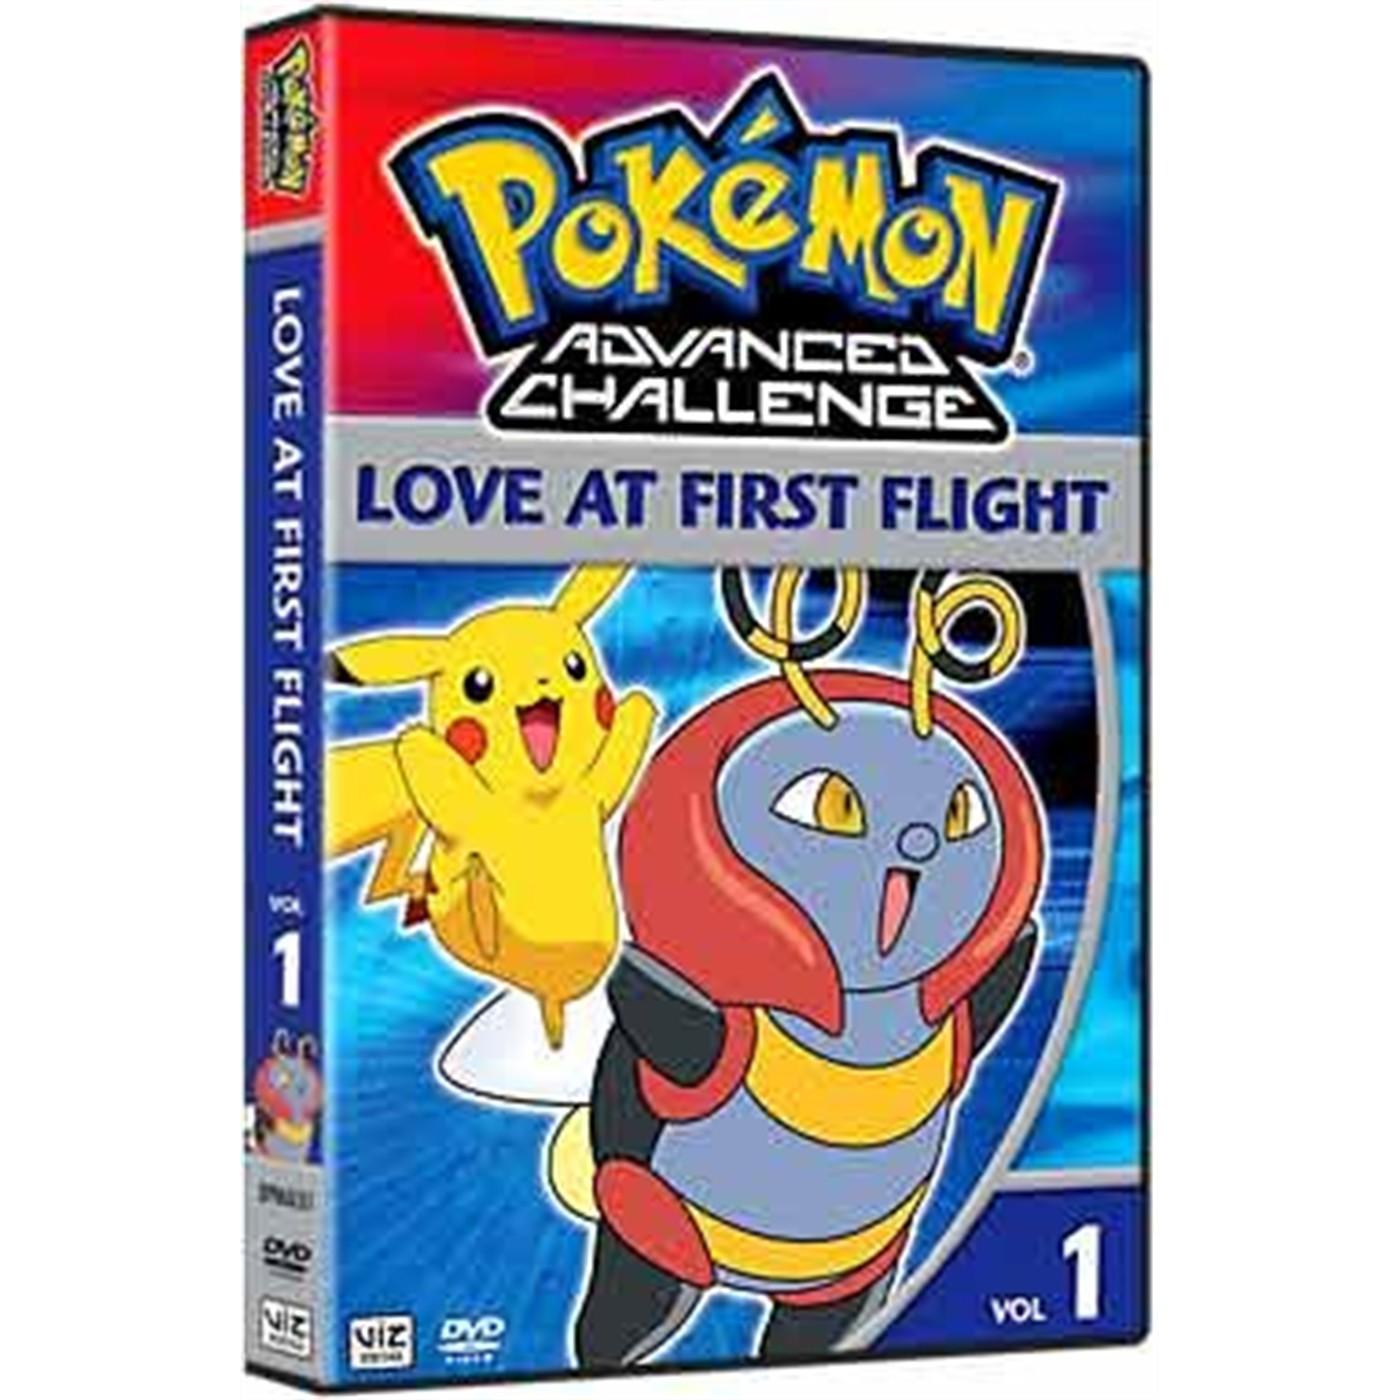 Pokemon Advanced Challenge, Vol. 1 (DVD)